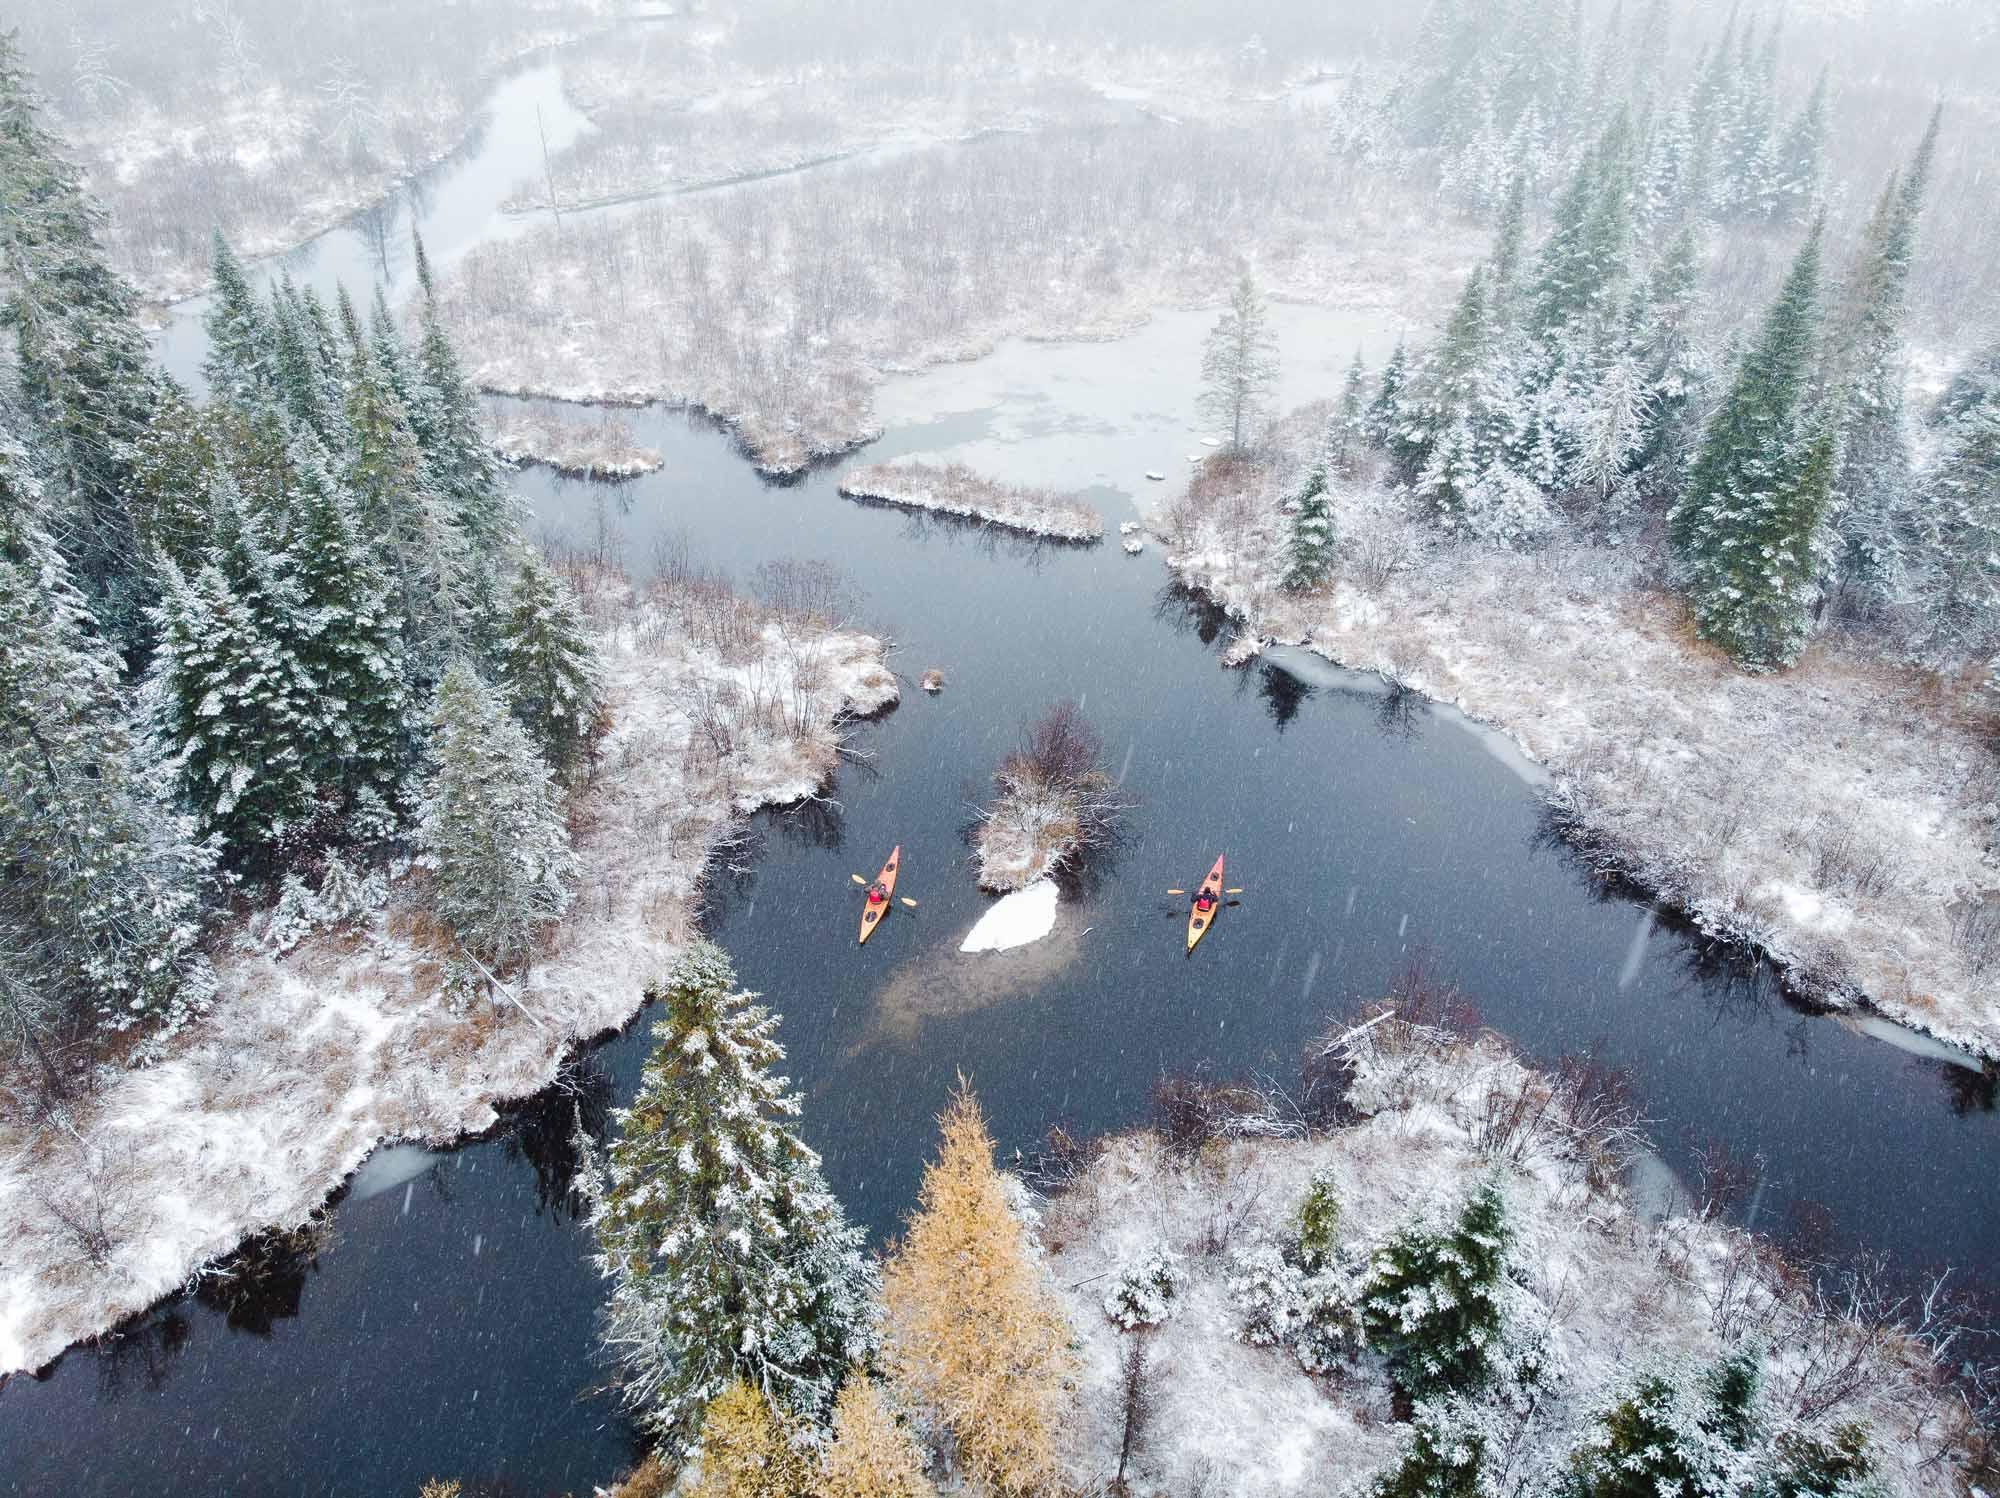 Quebec-Winter-showcase-kayakers-Lake-Stukely-photo-by-NICHOLAS-SPOONER